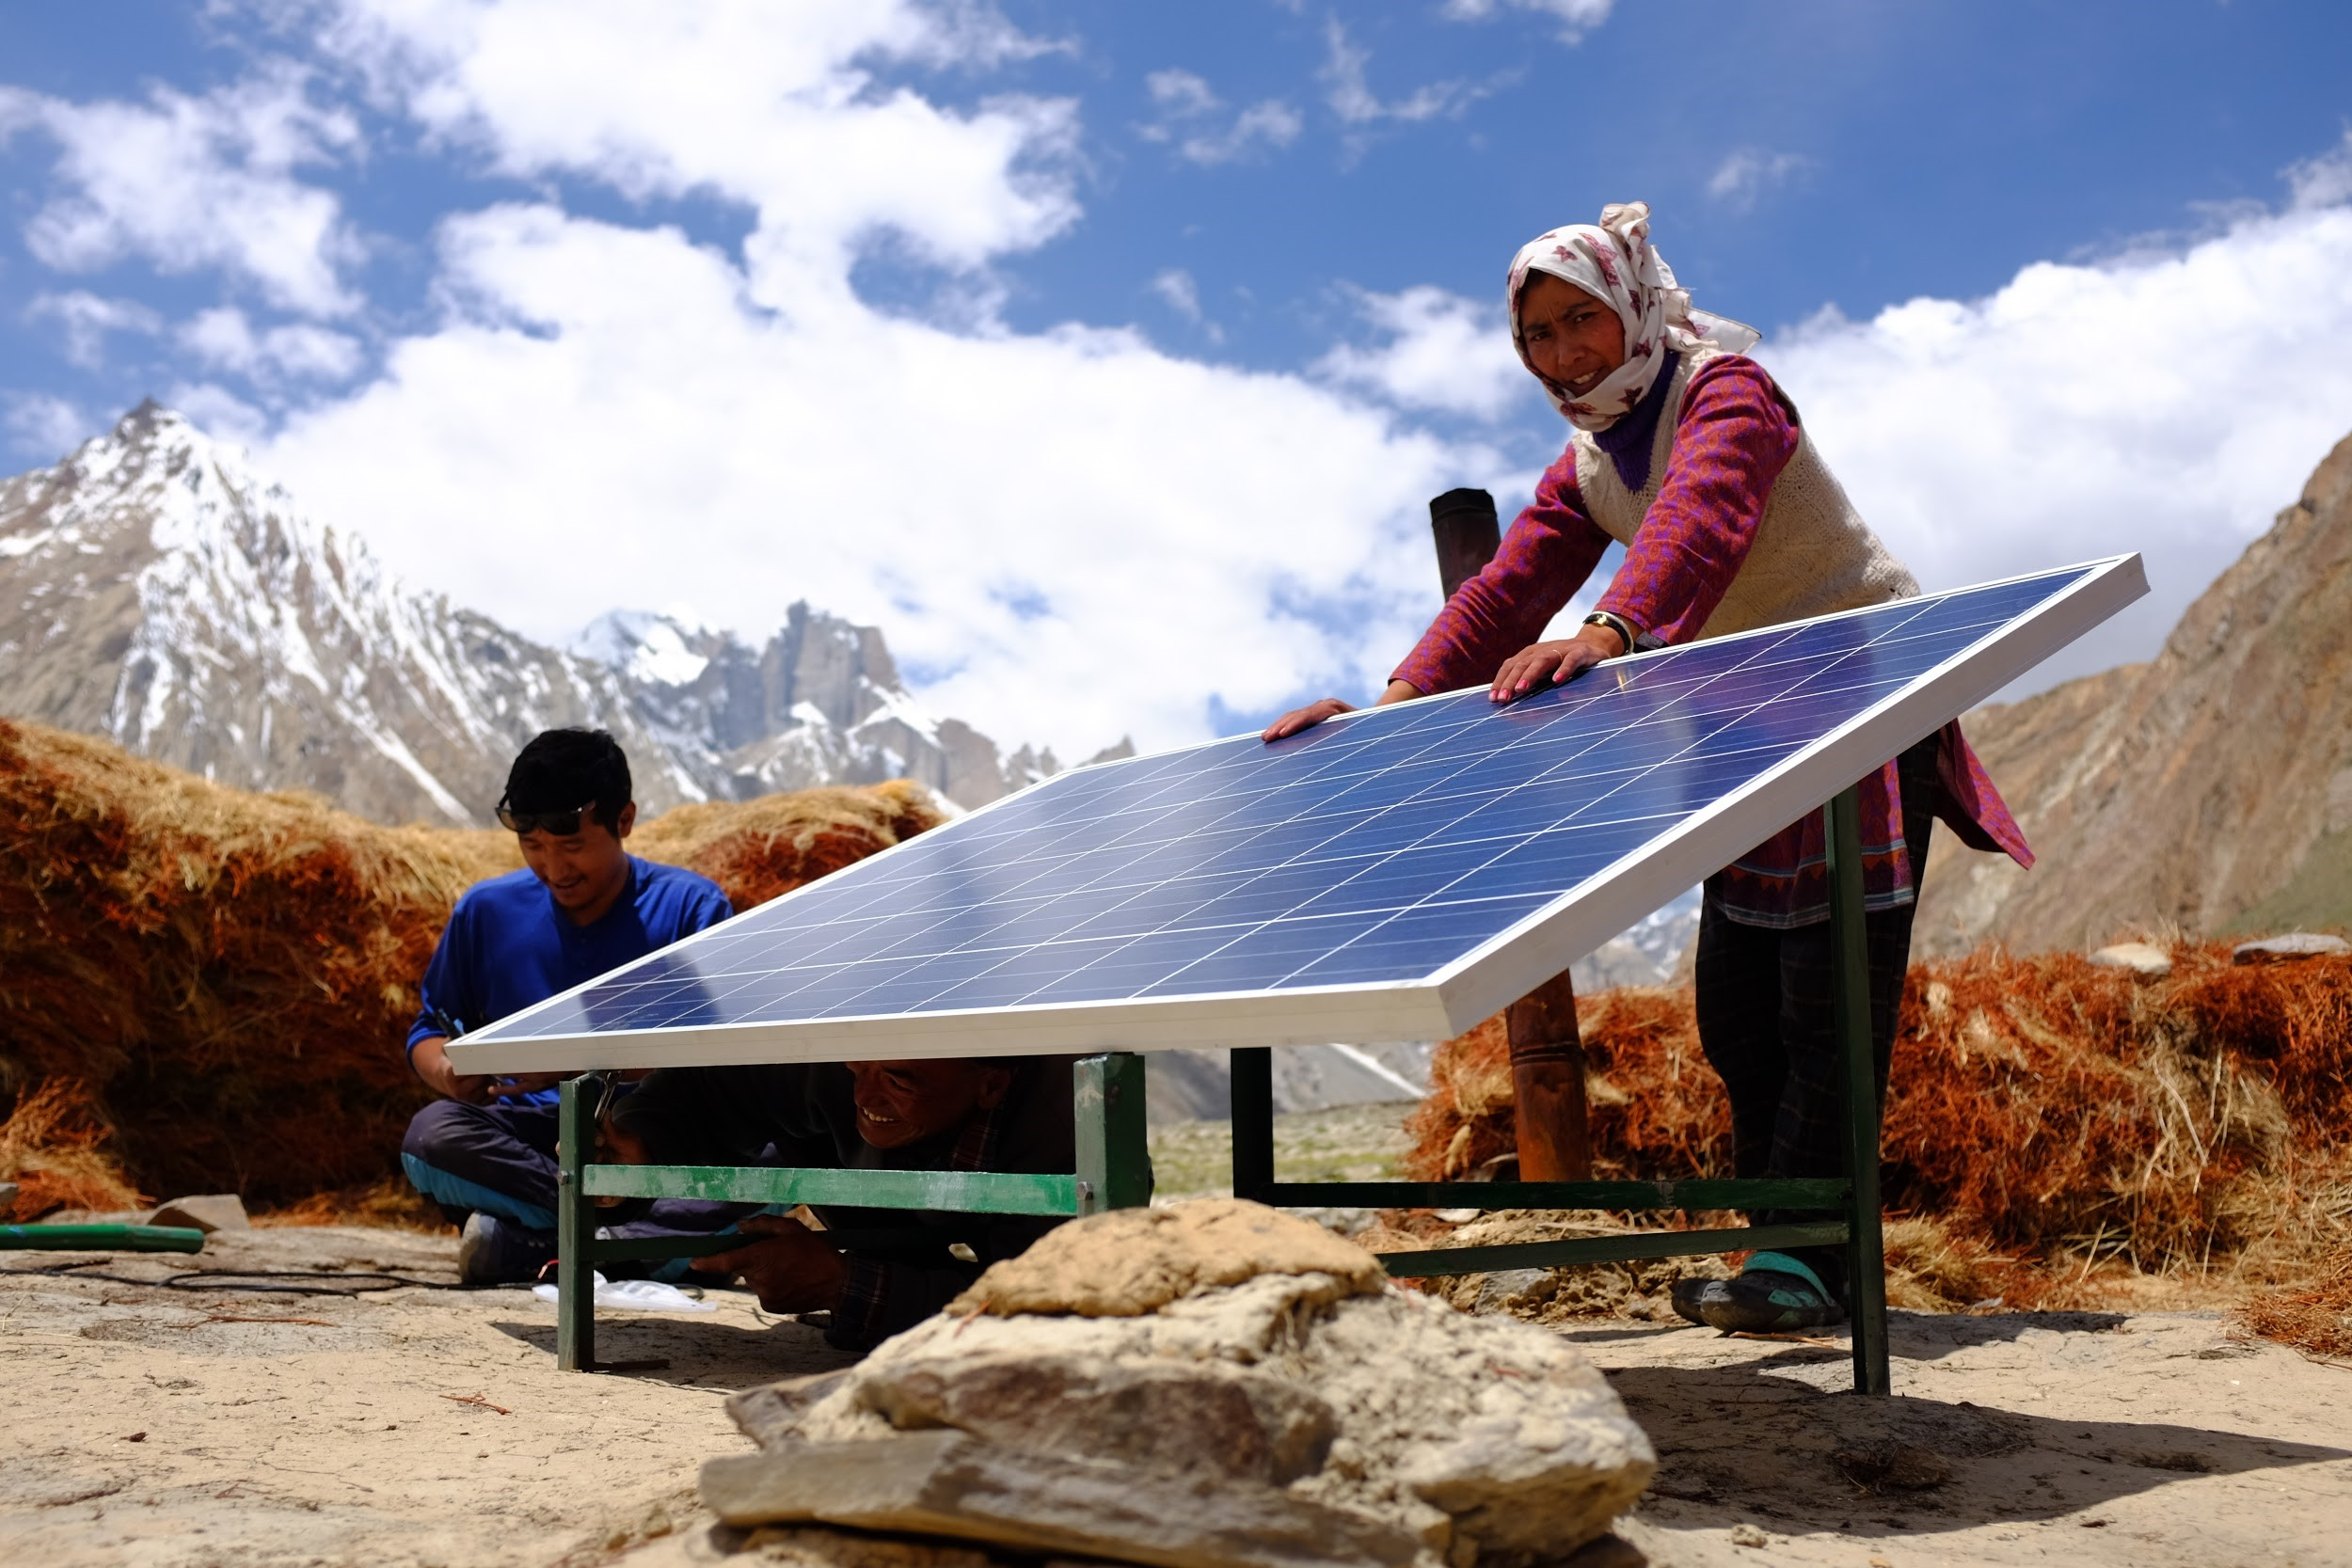 Solar Panel installed in Ladakh